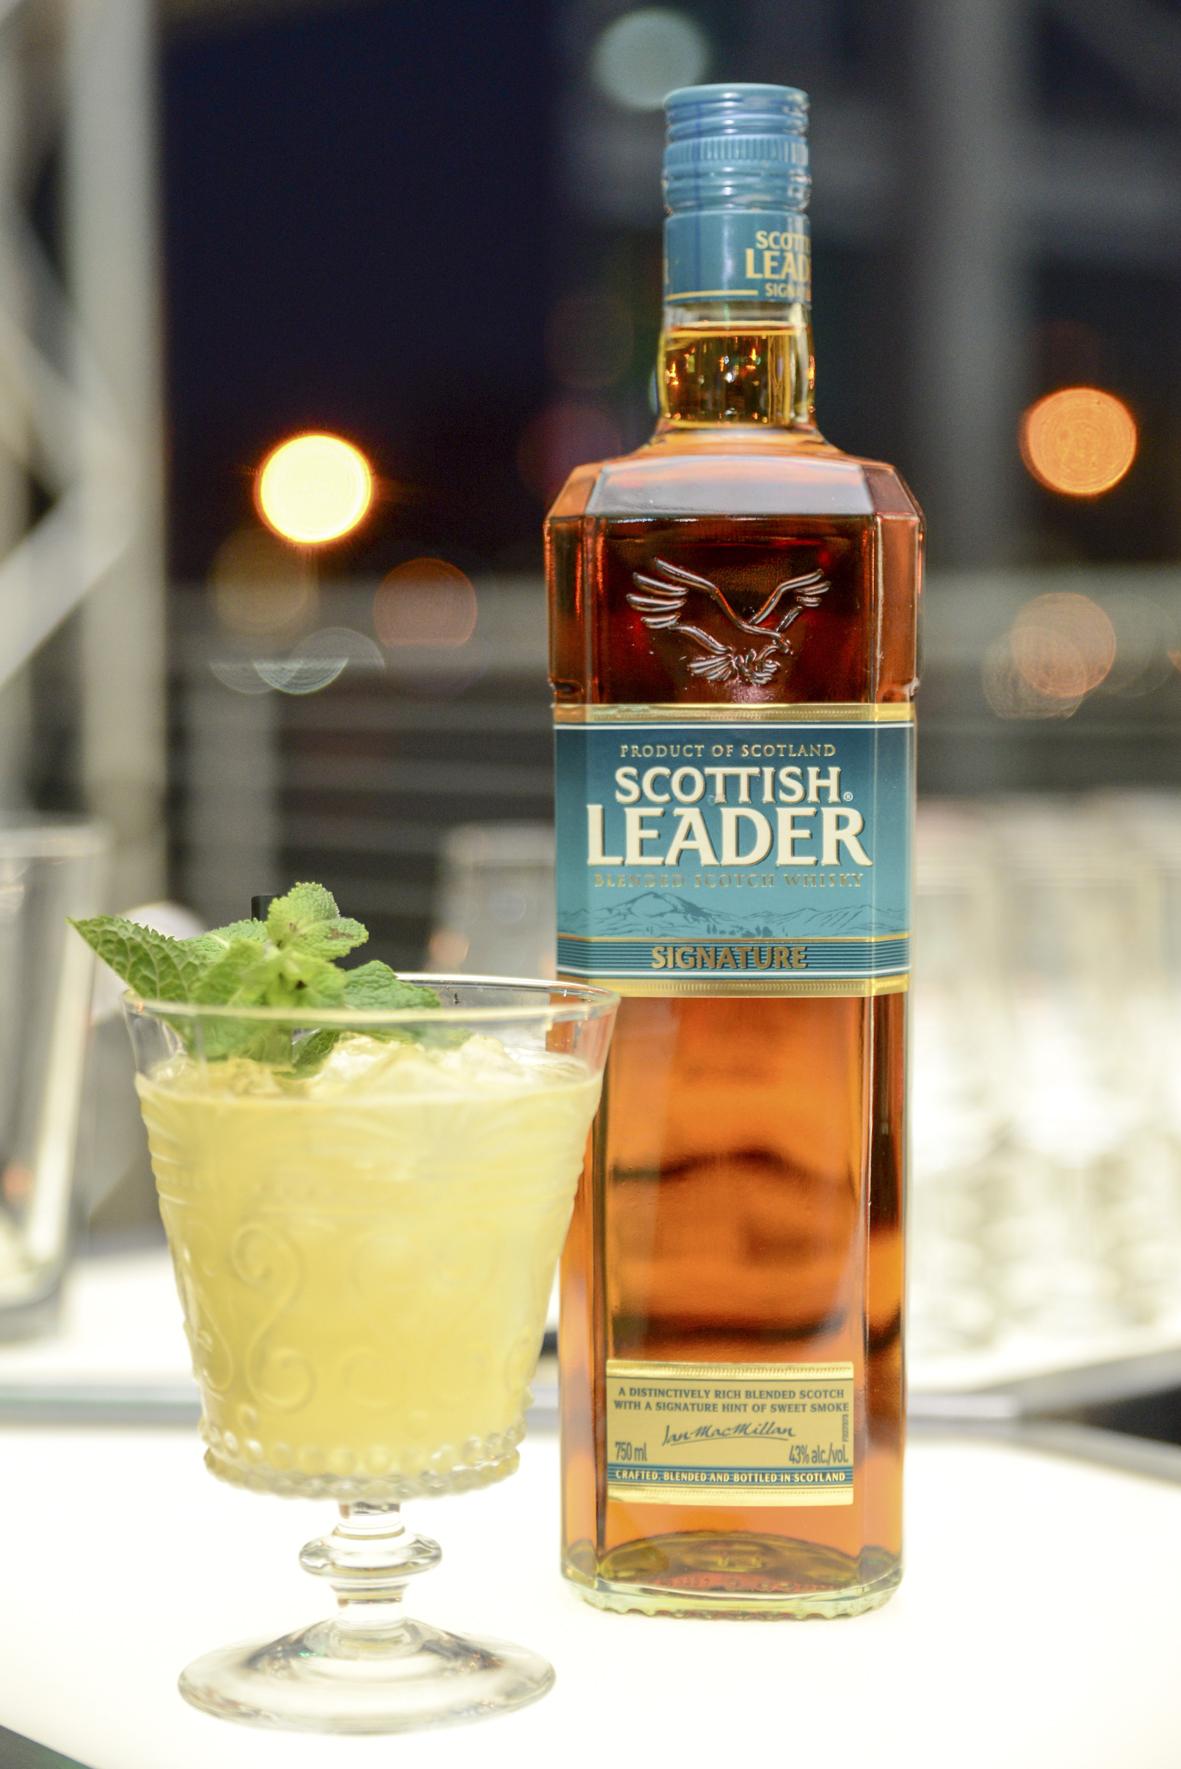 "<img alt=""scottish leader bottle and cocktail"">"